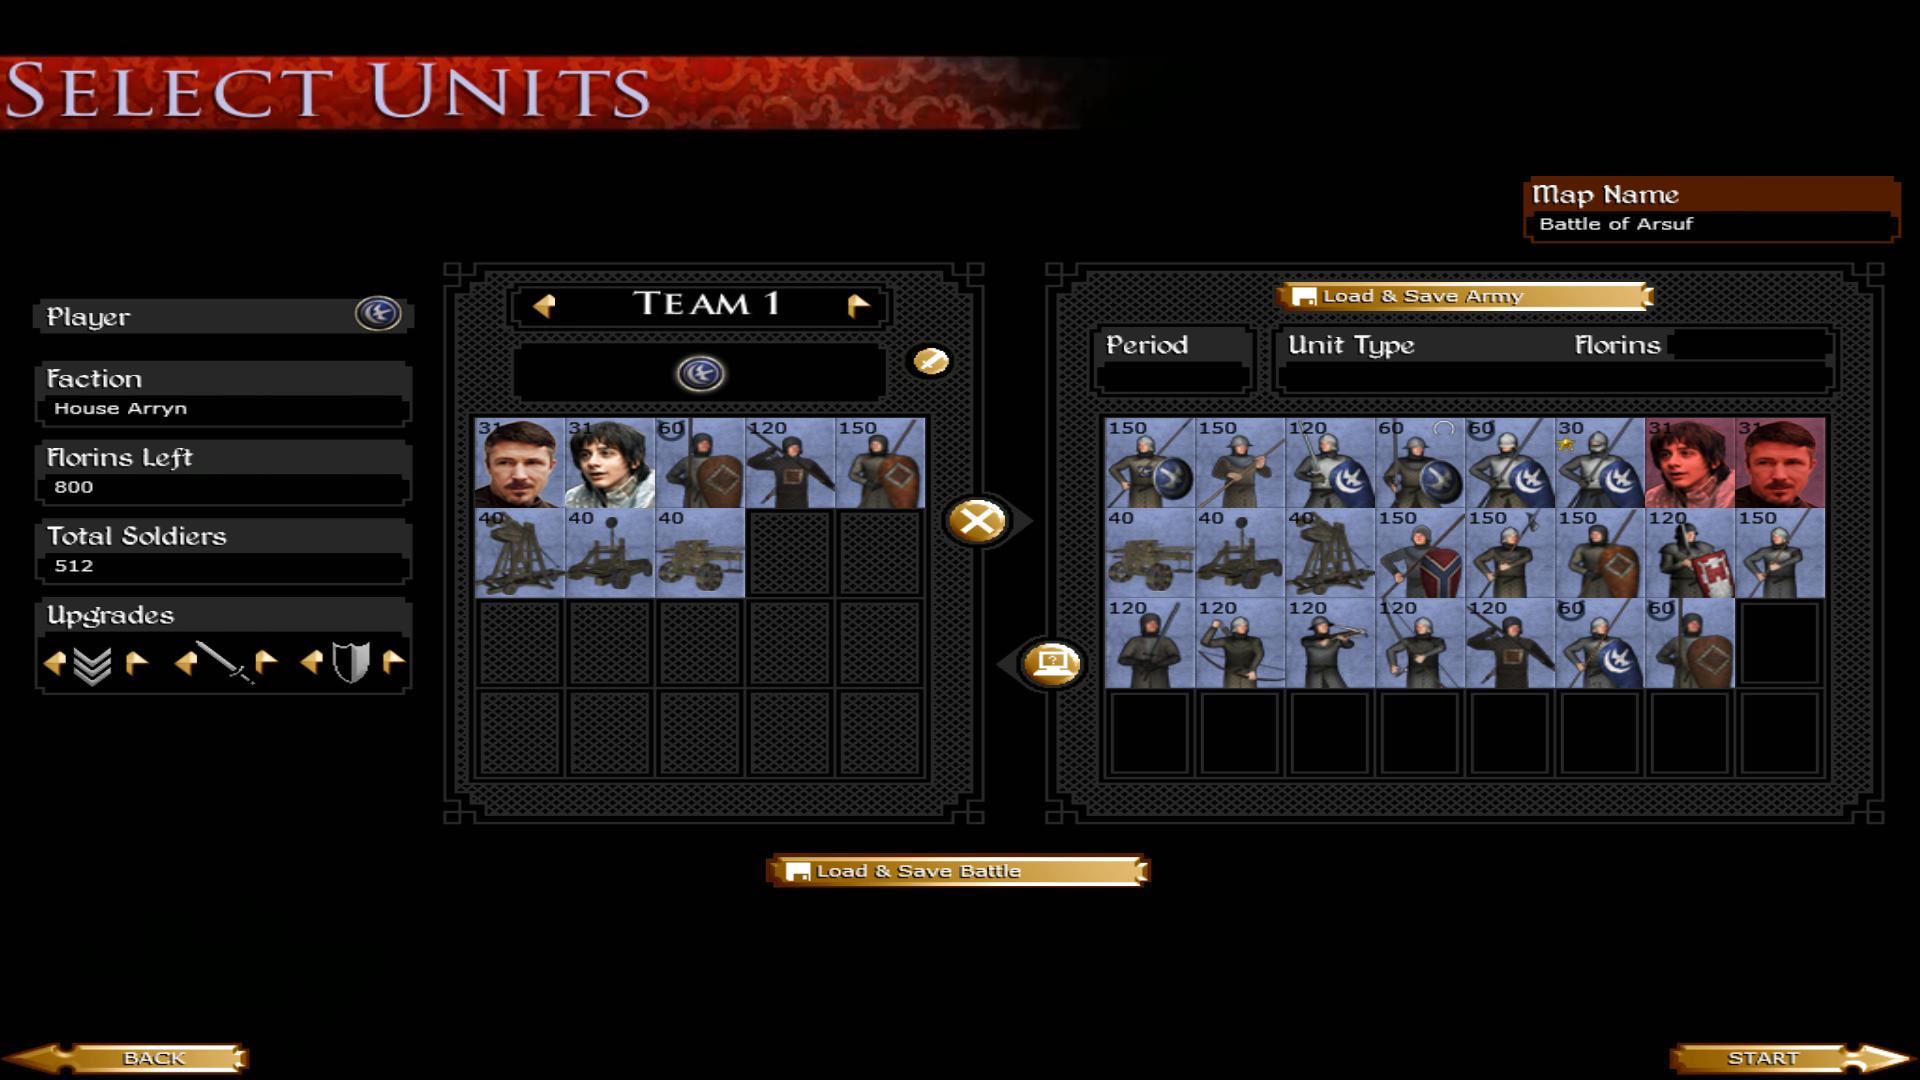 New House Arryn units!